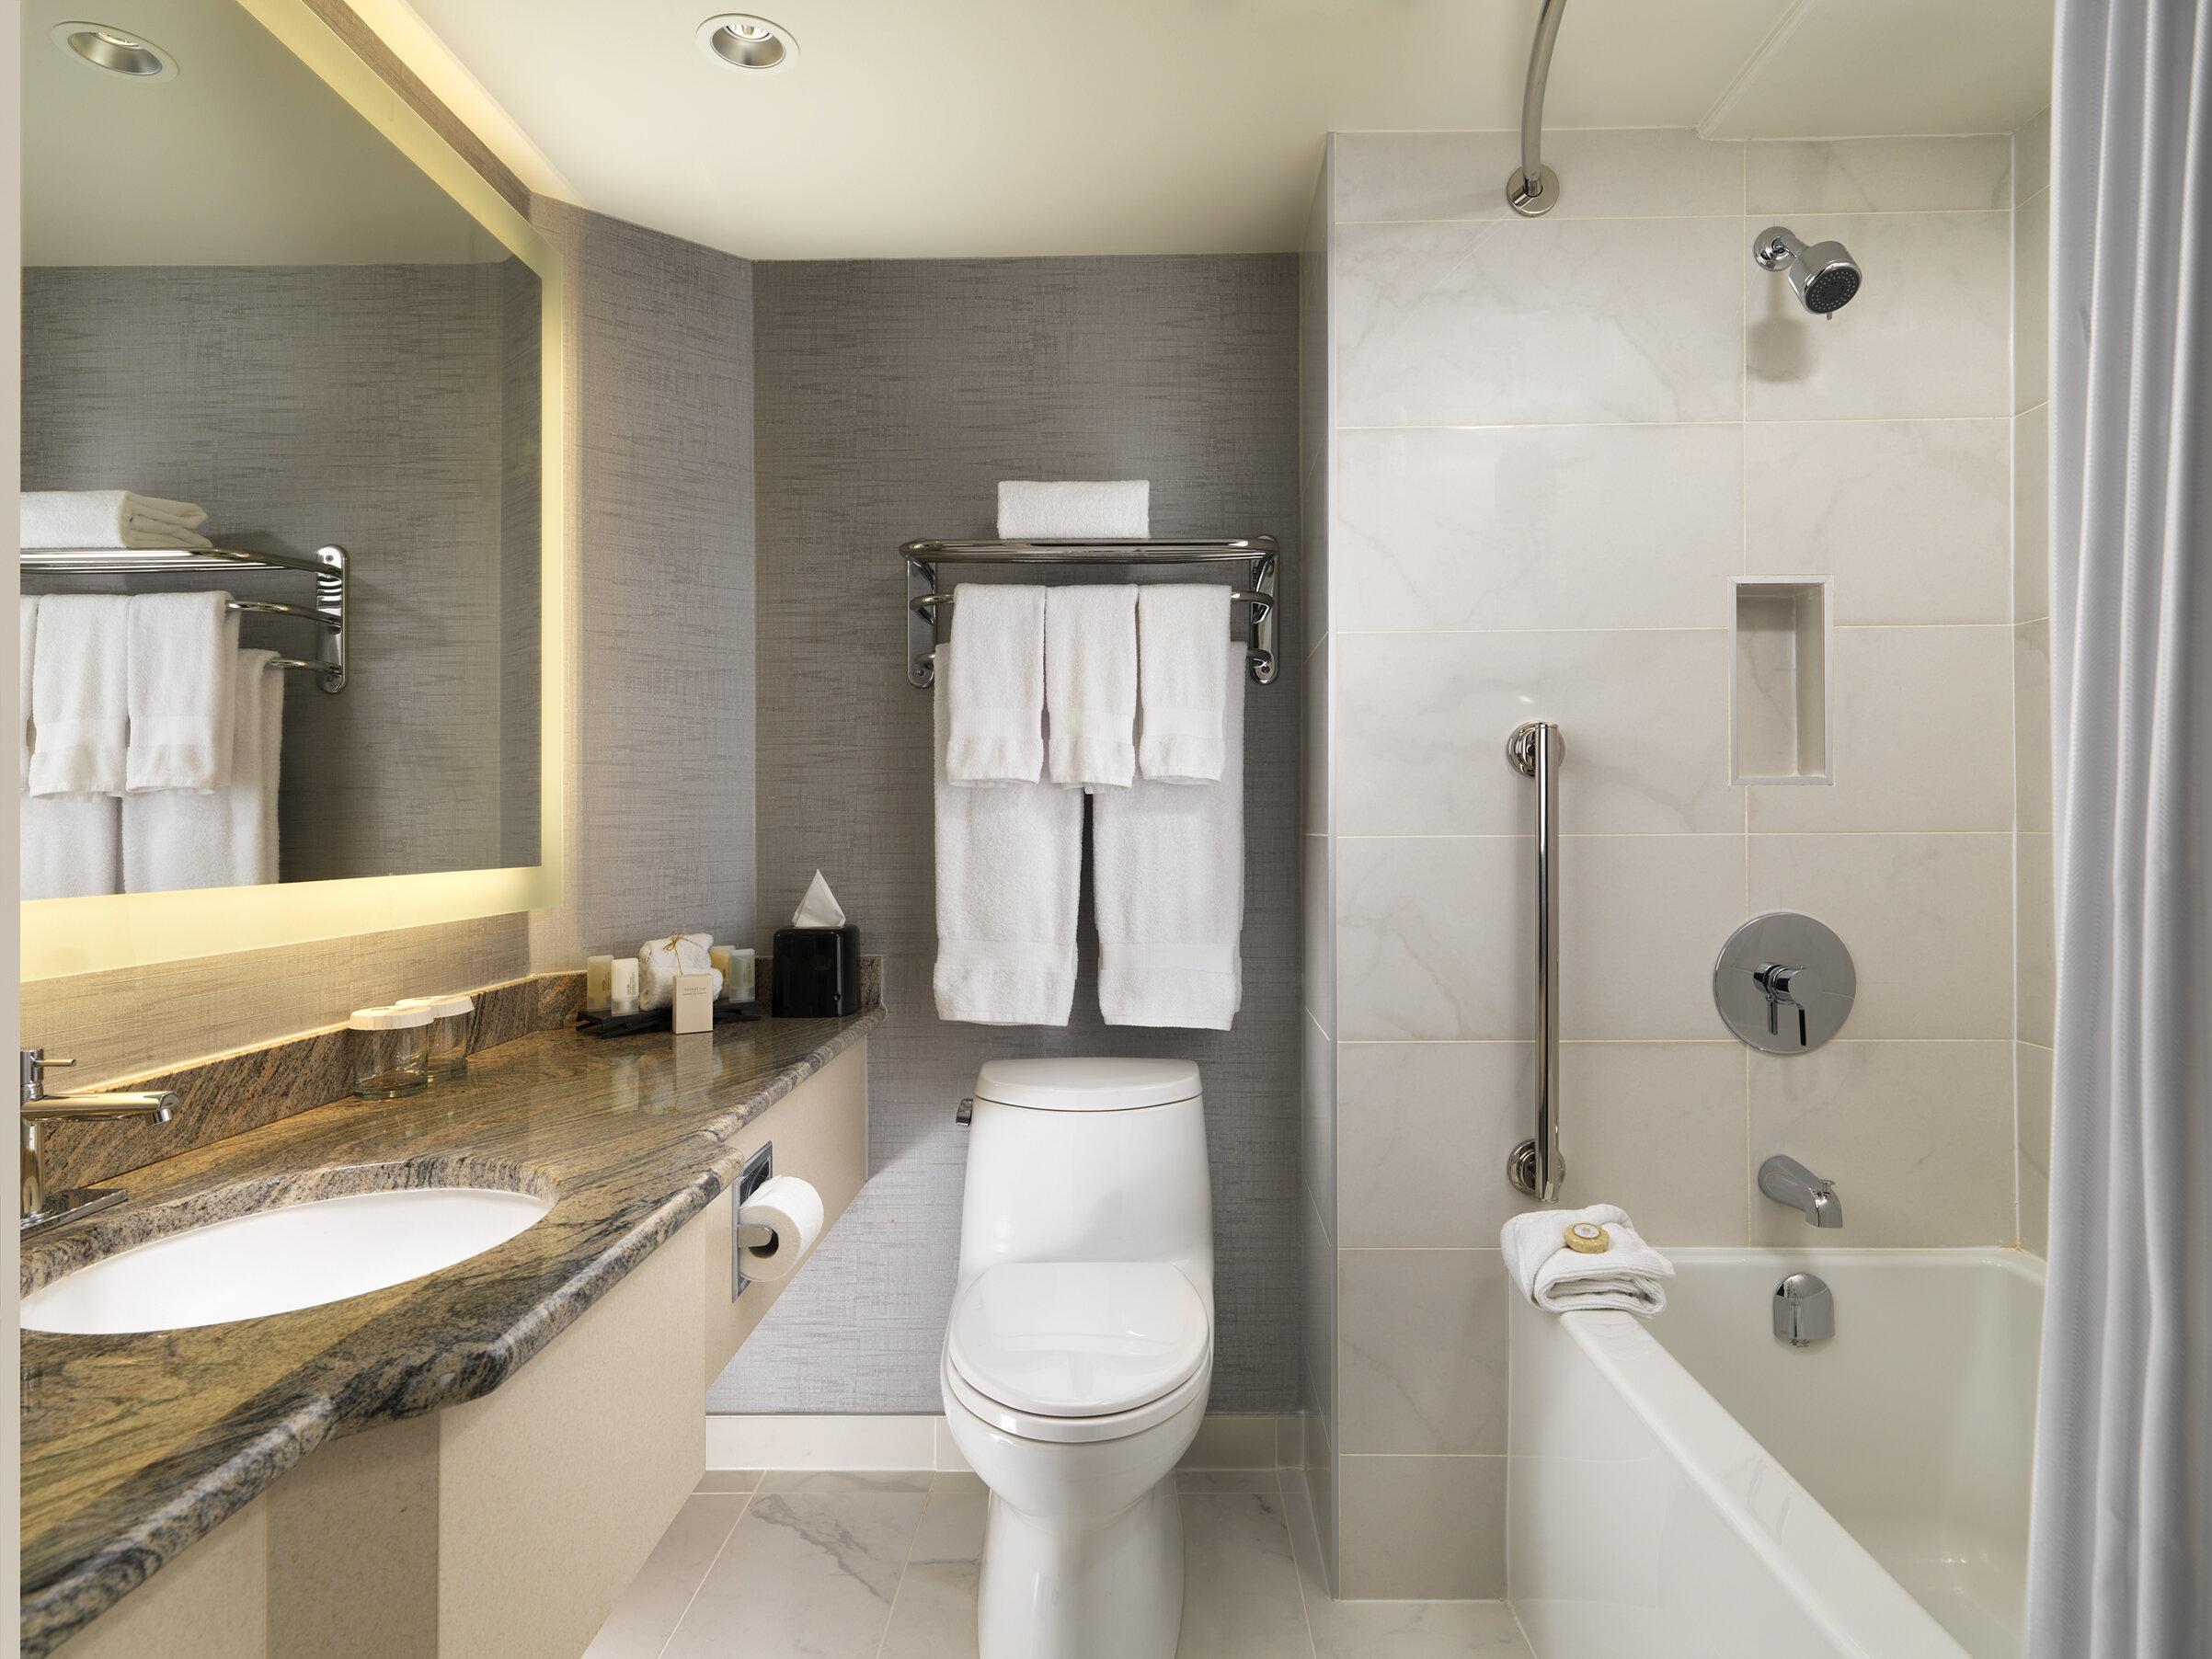 Copy of Signature room bathroom.jpg